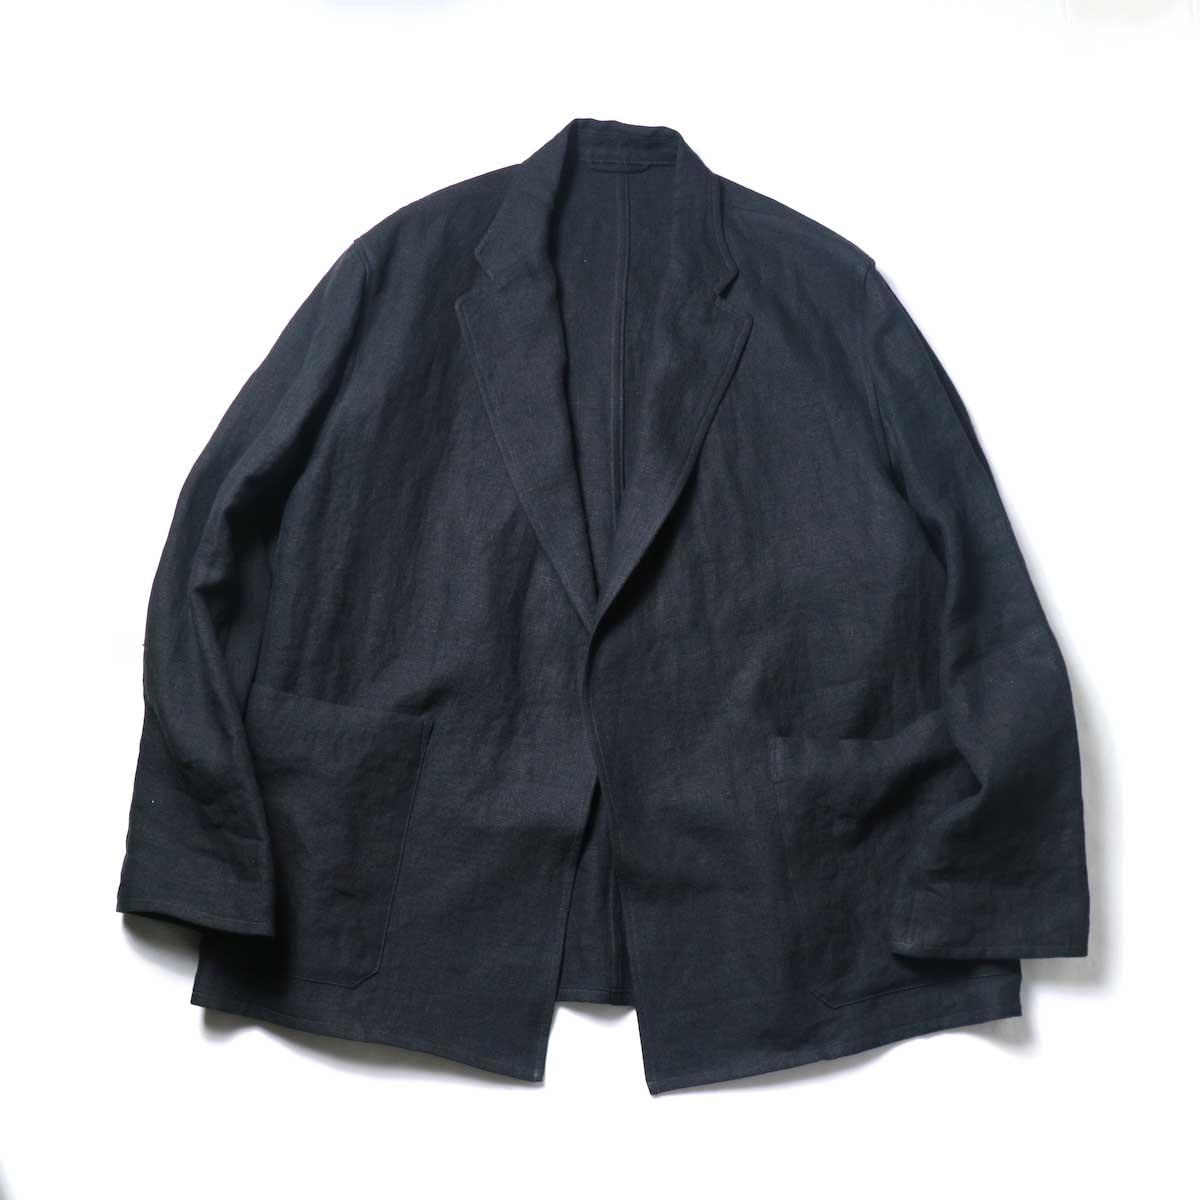 blurhms / Wash Linen Cardigan Jacket (Black)正面